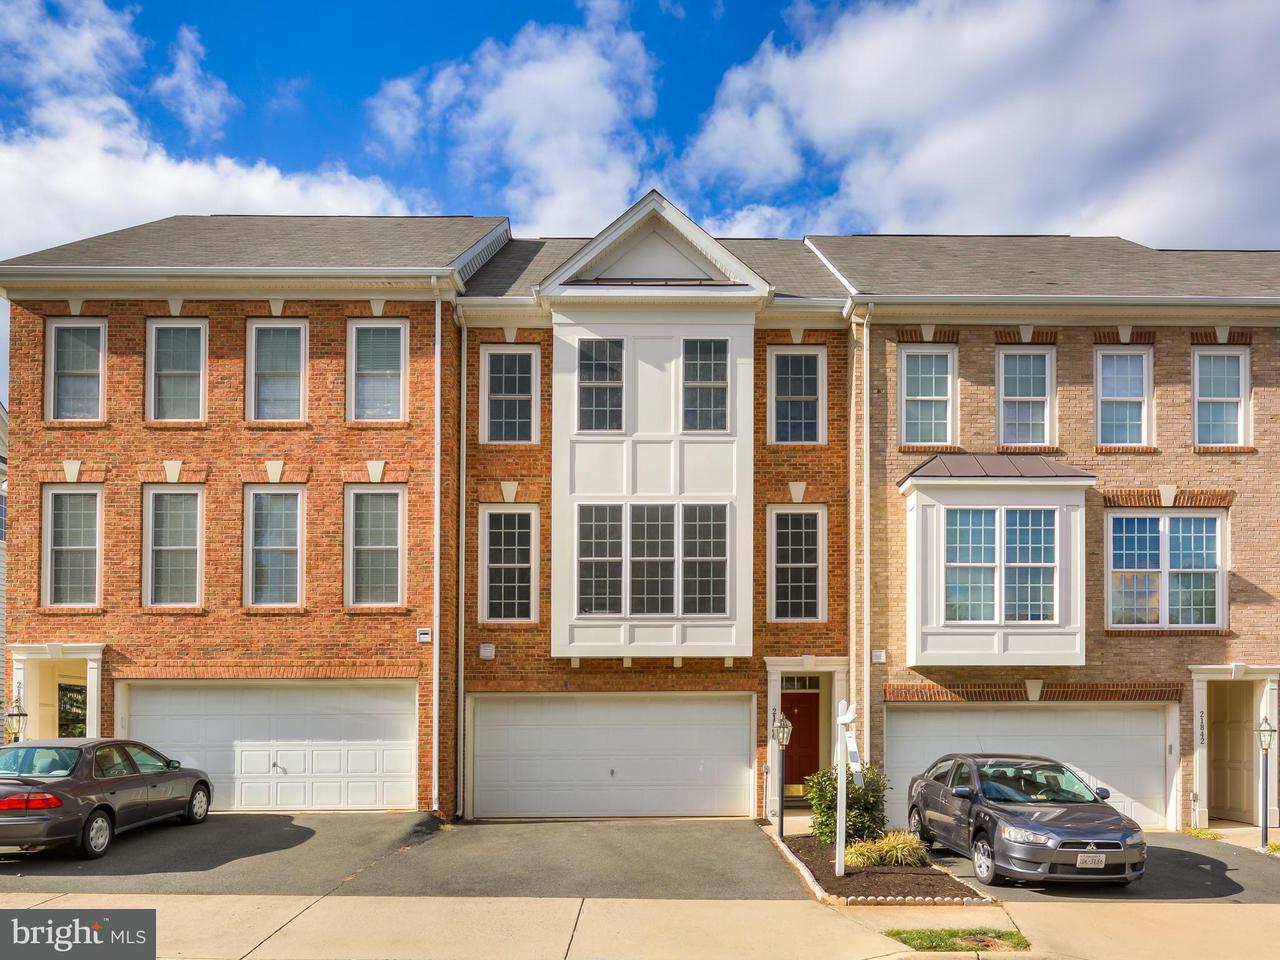 Townhouse for Sale at 21840 LADYSLIPPER SQ 21840 LADYSLIPPER SQ Ashburn, Virginia 20147 United States